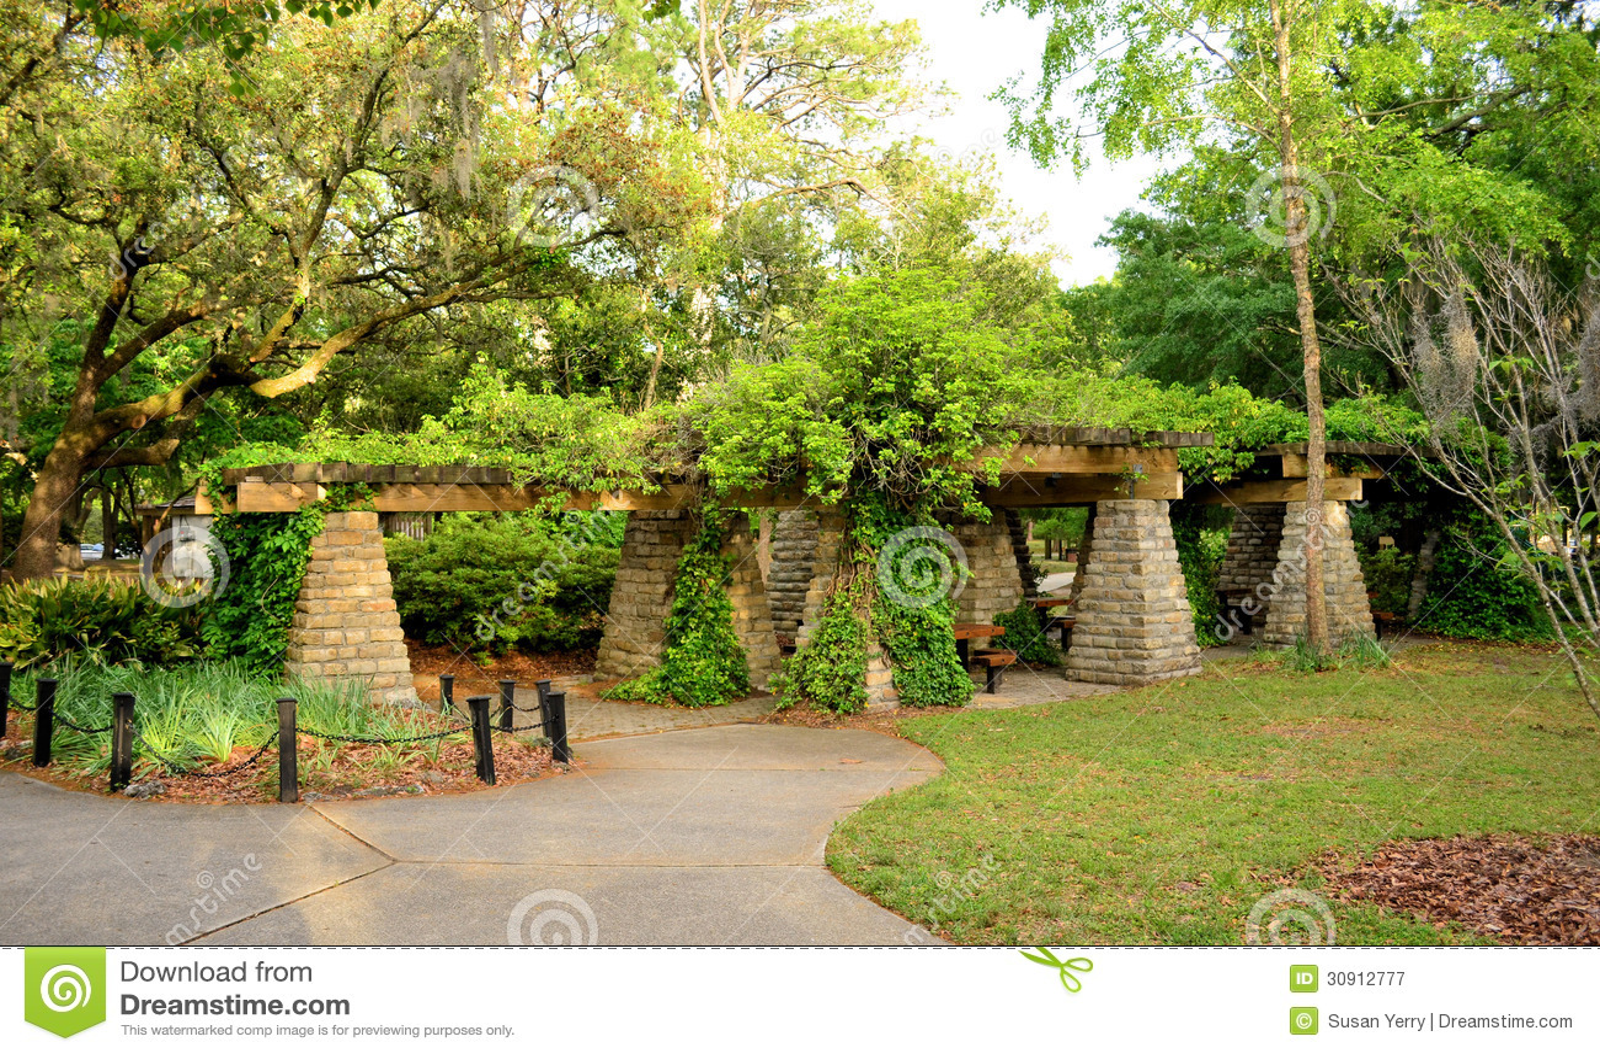 Vine Covered Gazebo Picnic Area Stock Image Image Of